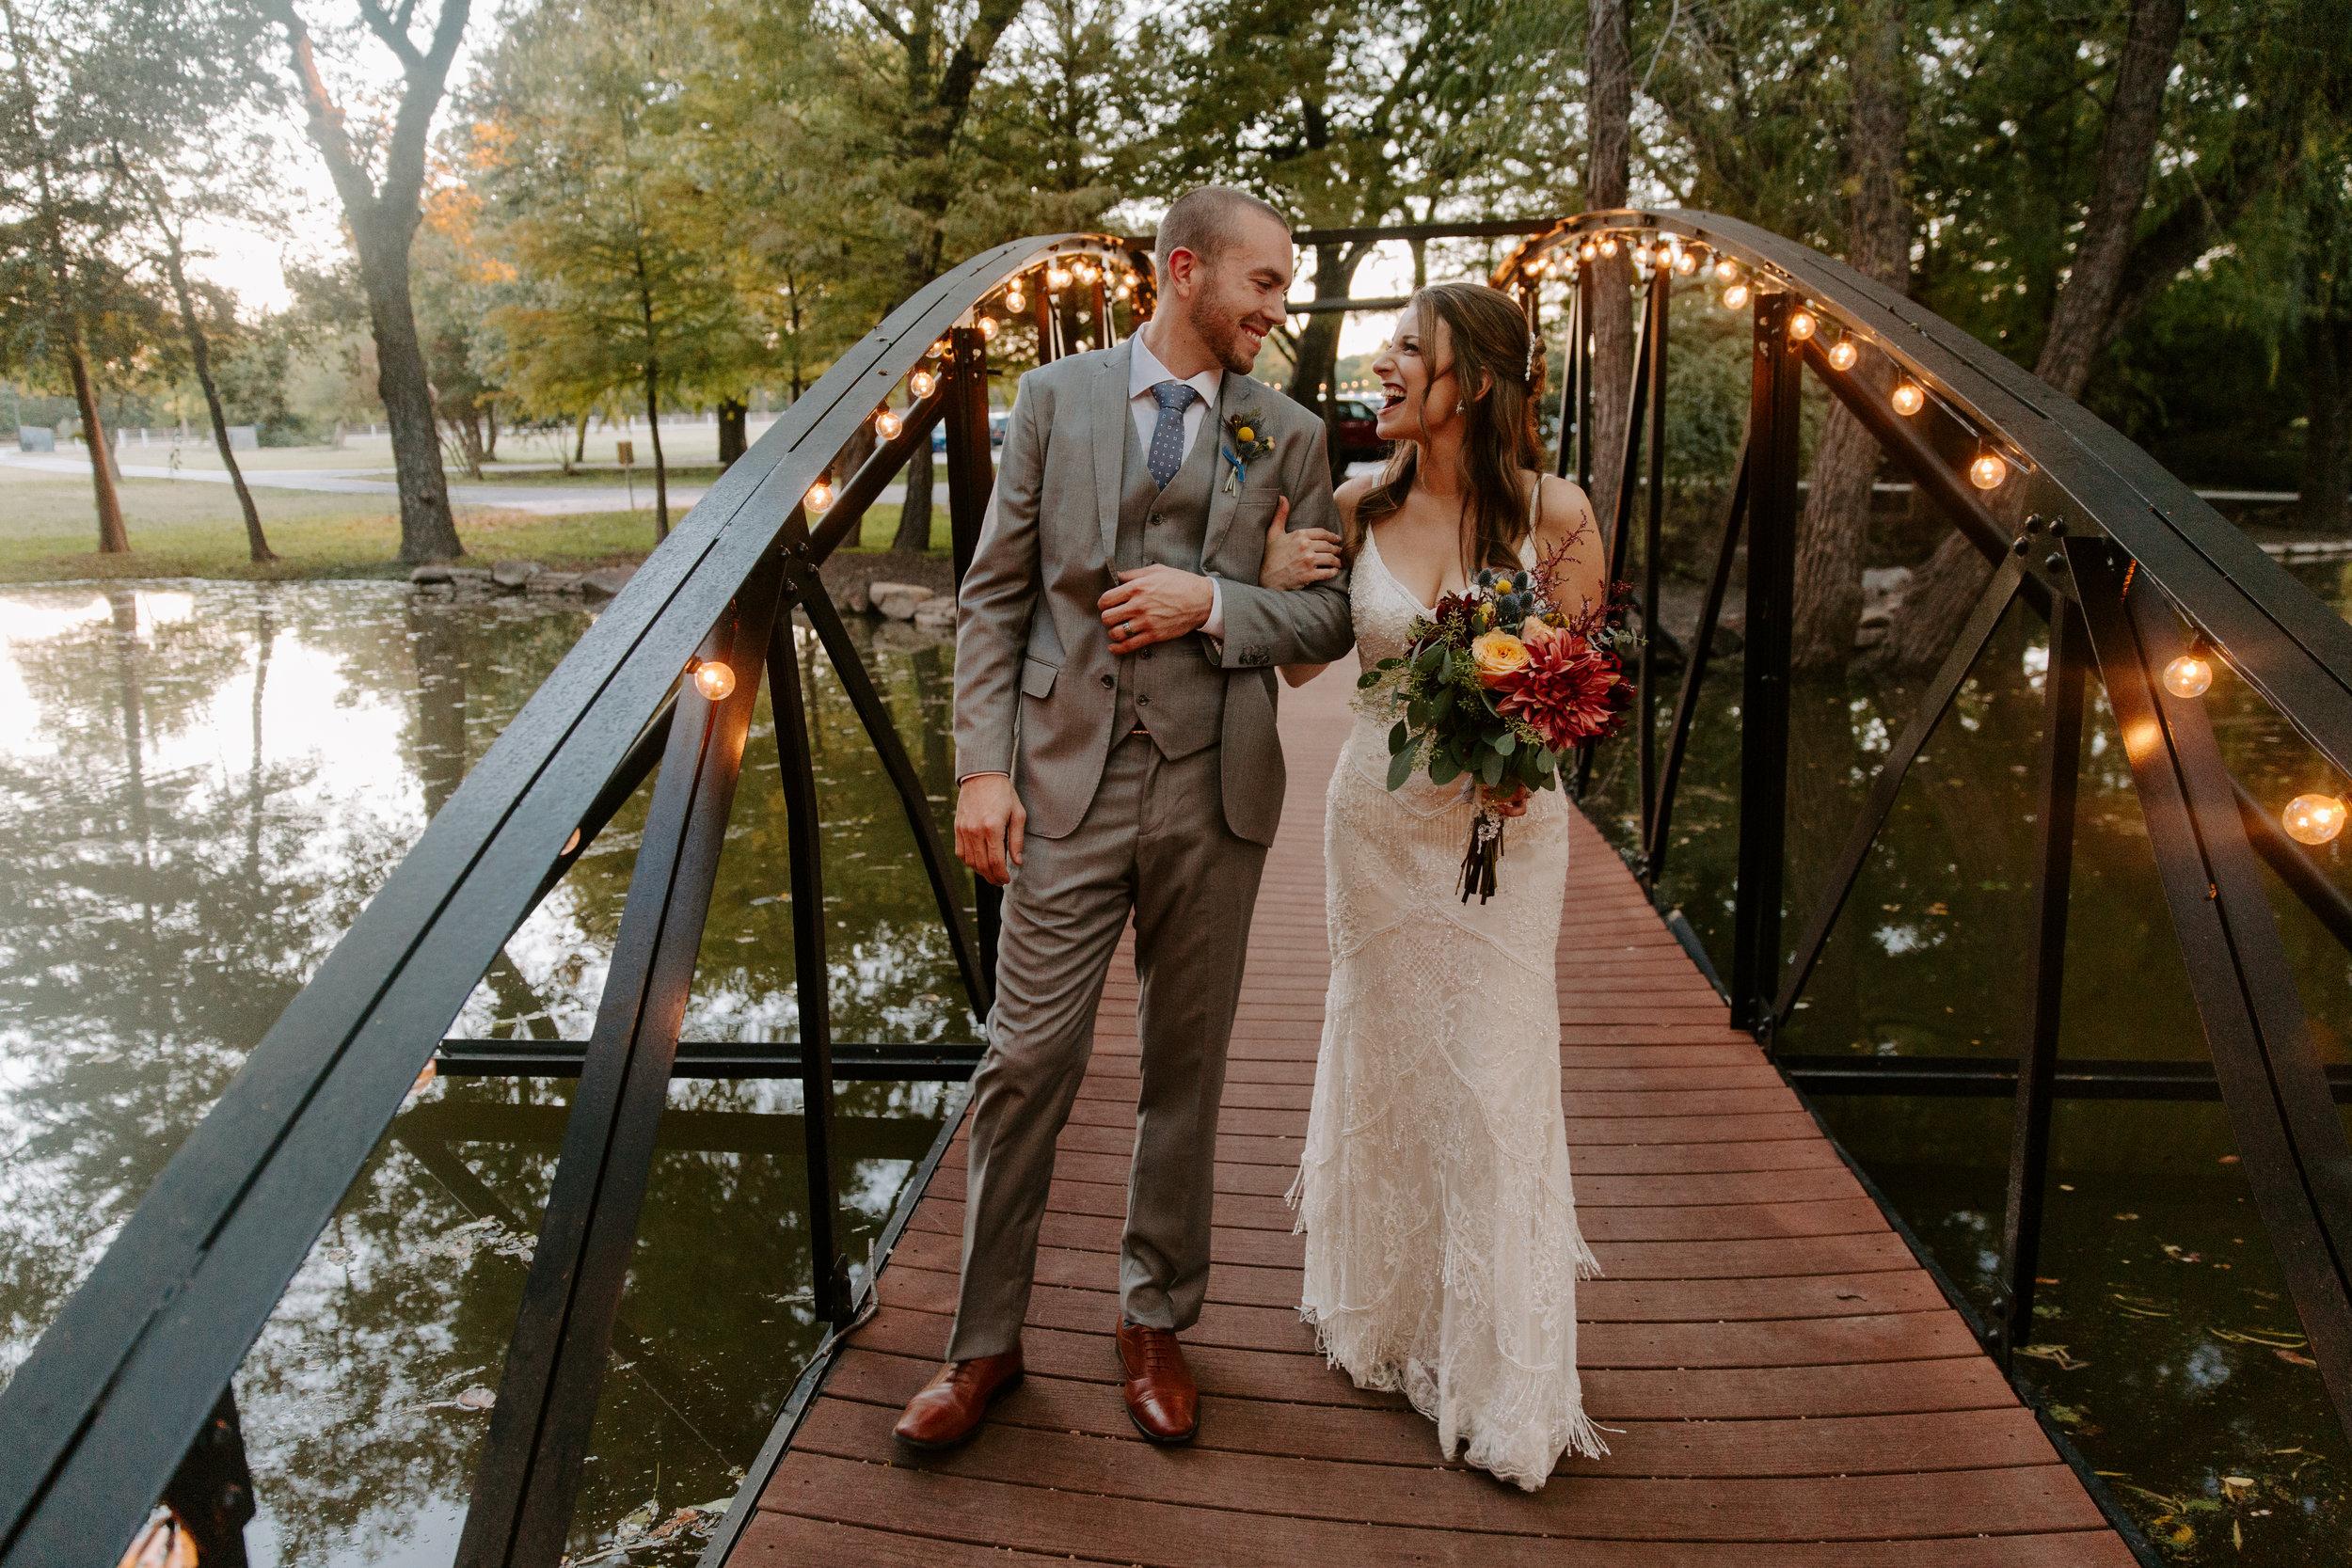 Worley Wedding - Arden and Eric - Wedding Photos - Sneak Peek -Meme Urbane Photography_-25.jpg